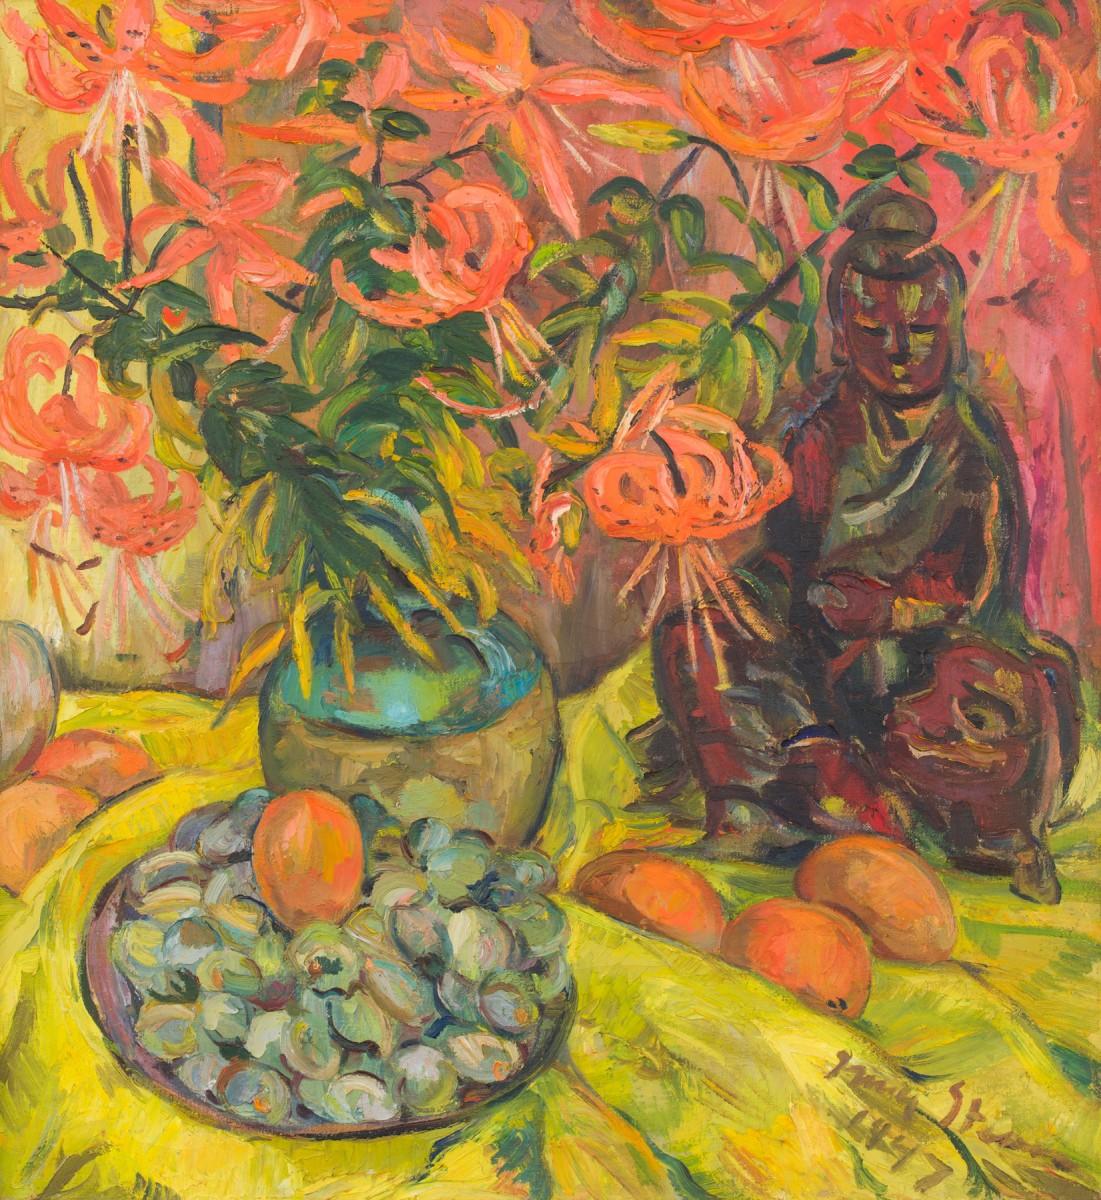 Irma Stern, <i>Still Life with Lilies</i> (1947). R5 000 000 – 7 000 000